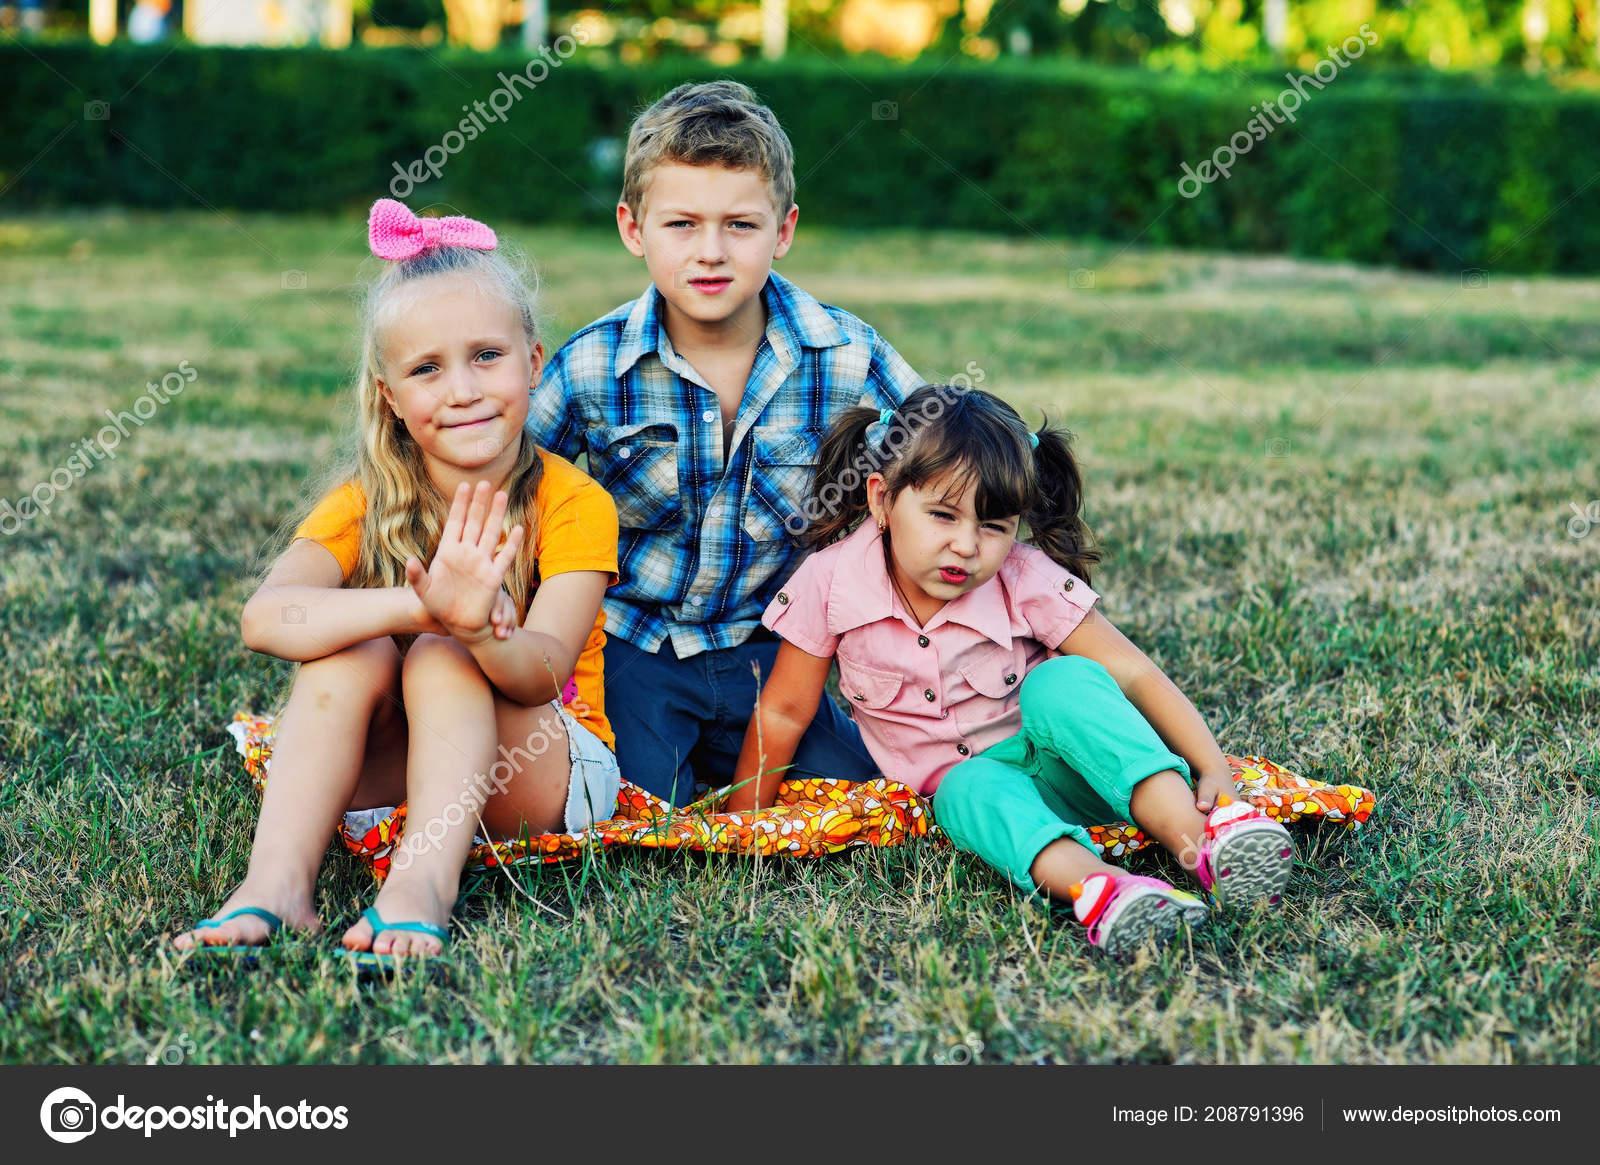 0dfff9ffb73 Αστεία χαριτωμένα παιδιά να παίζουν στο γρασίδι. Φίλοι τα παιδιά να  διασκεδάσουν με τα πόδια — Εικόνα από ...